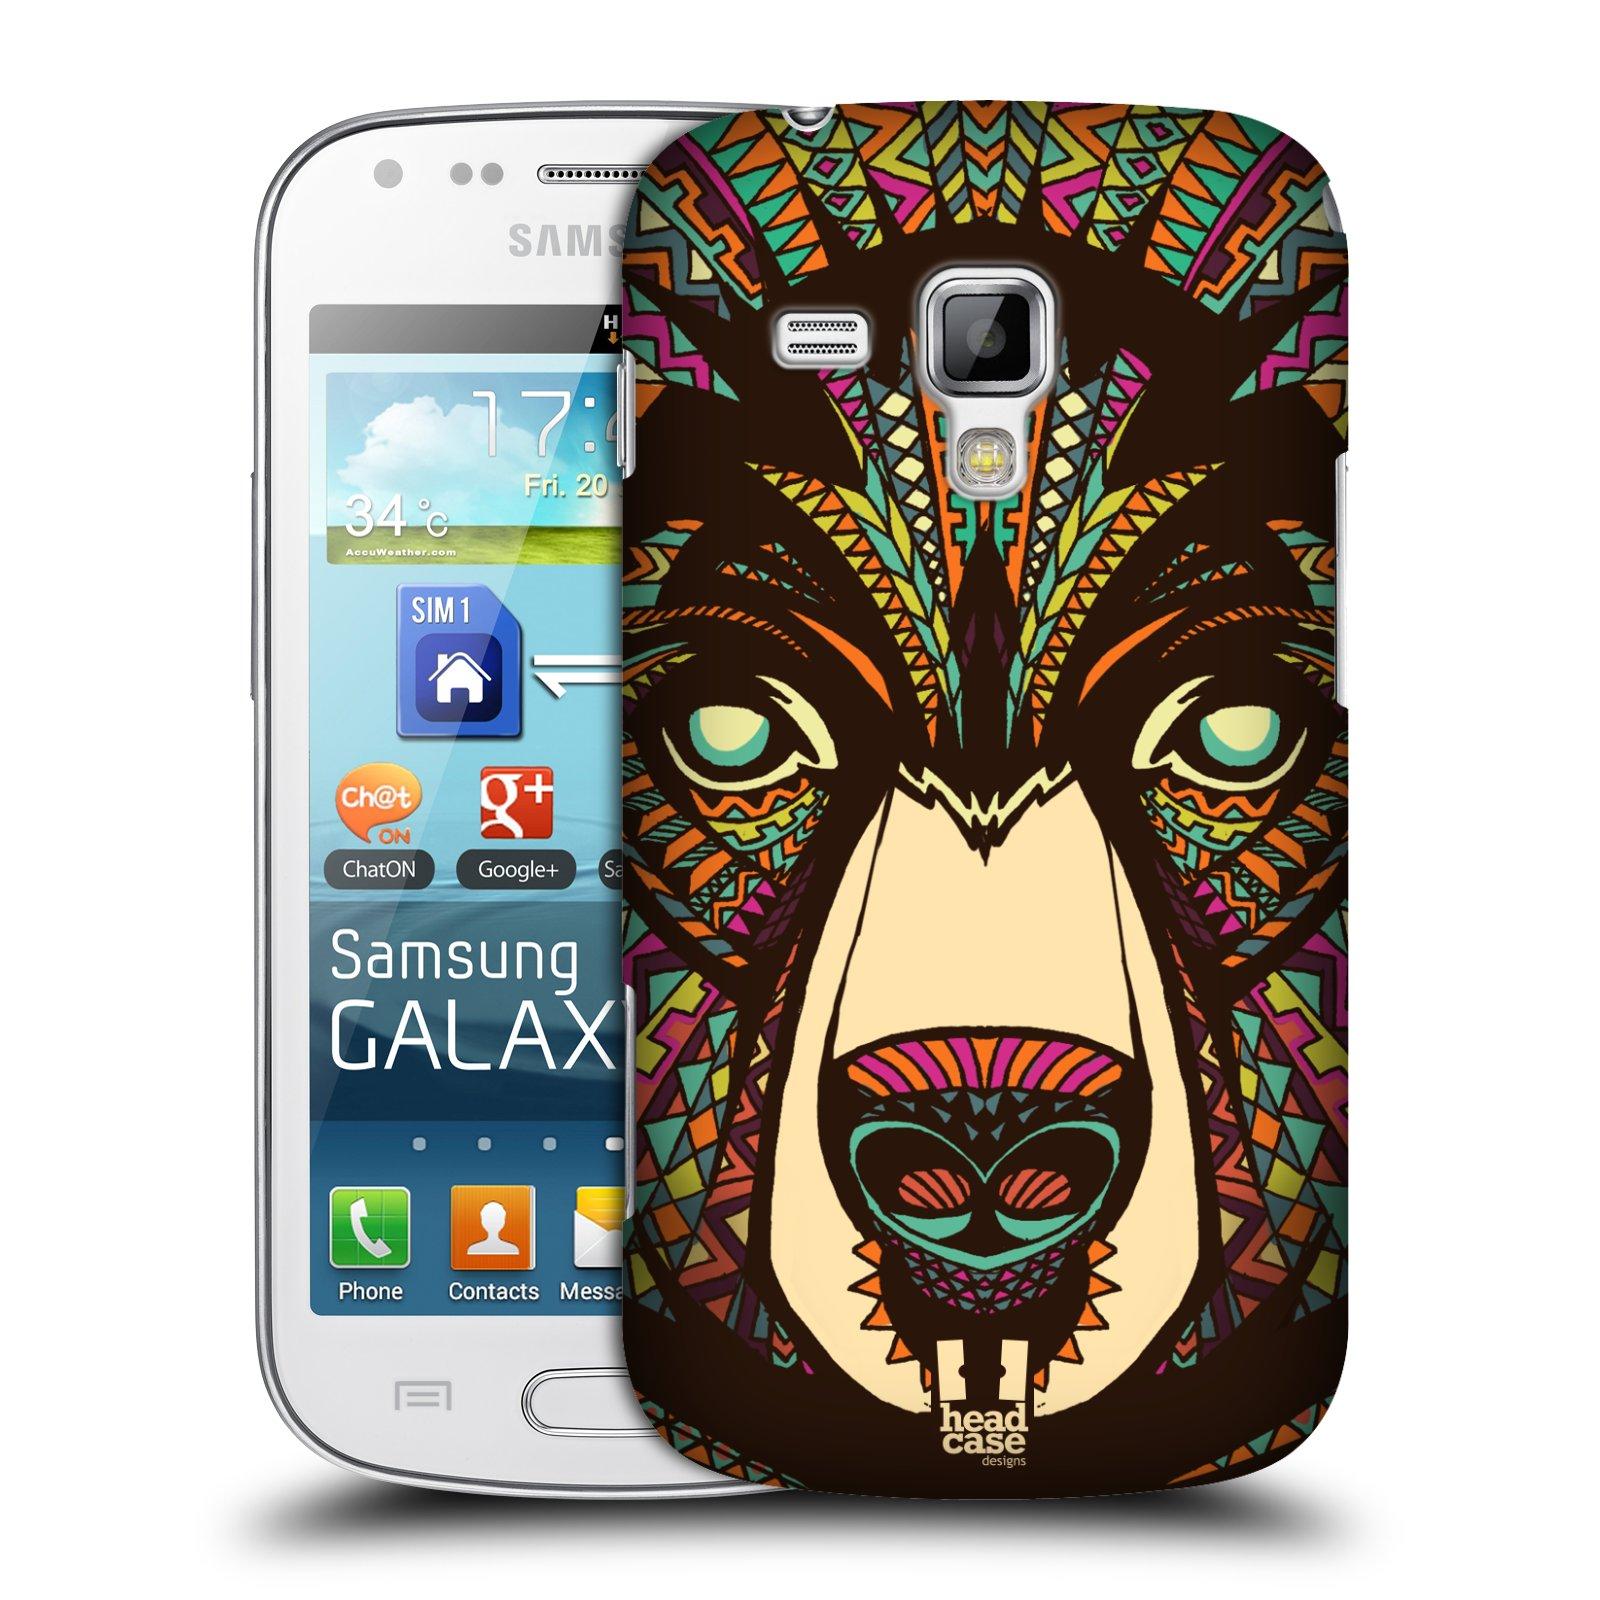 Plastové pouzdro na mobil Samsung Galaxy S Duos HEAD CASE AZTEC MEDVĚD (Kryt či obal na mobilní telefon Samsung Galaxy S Duos GT-S7562)